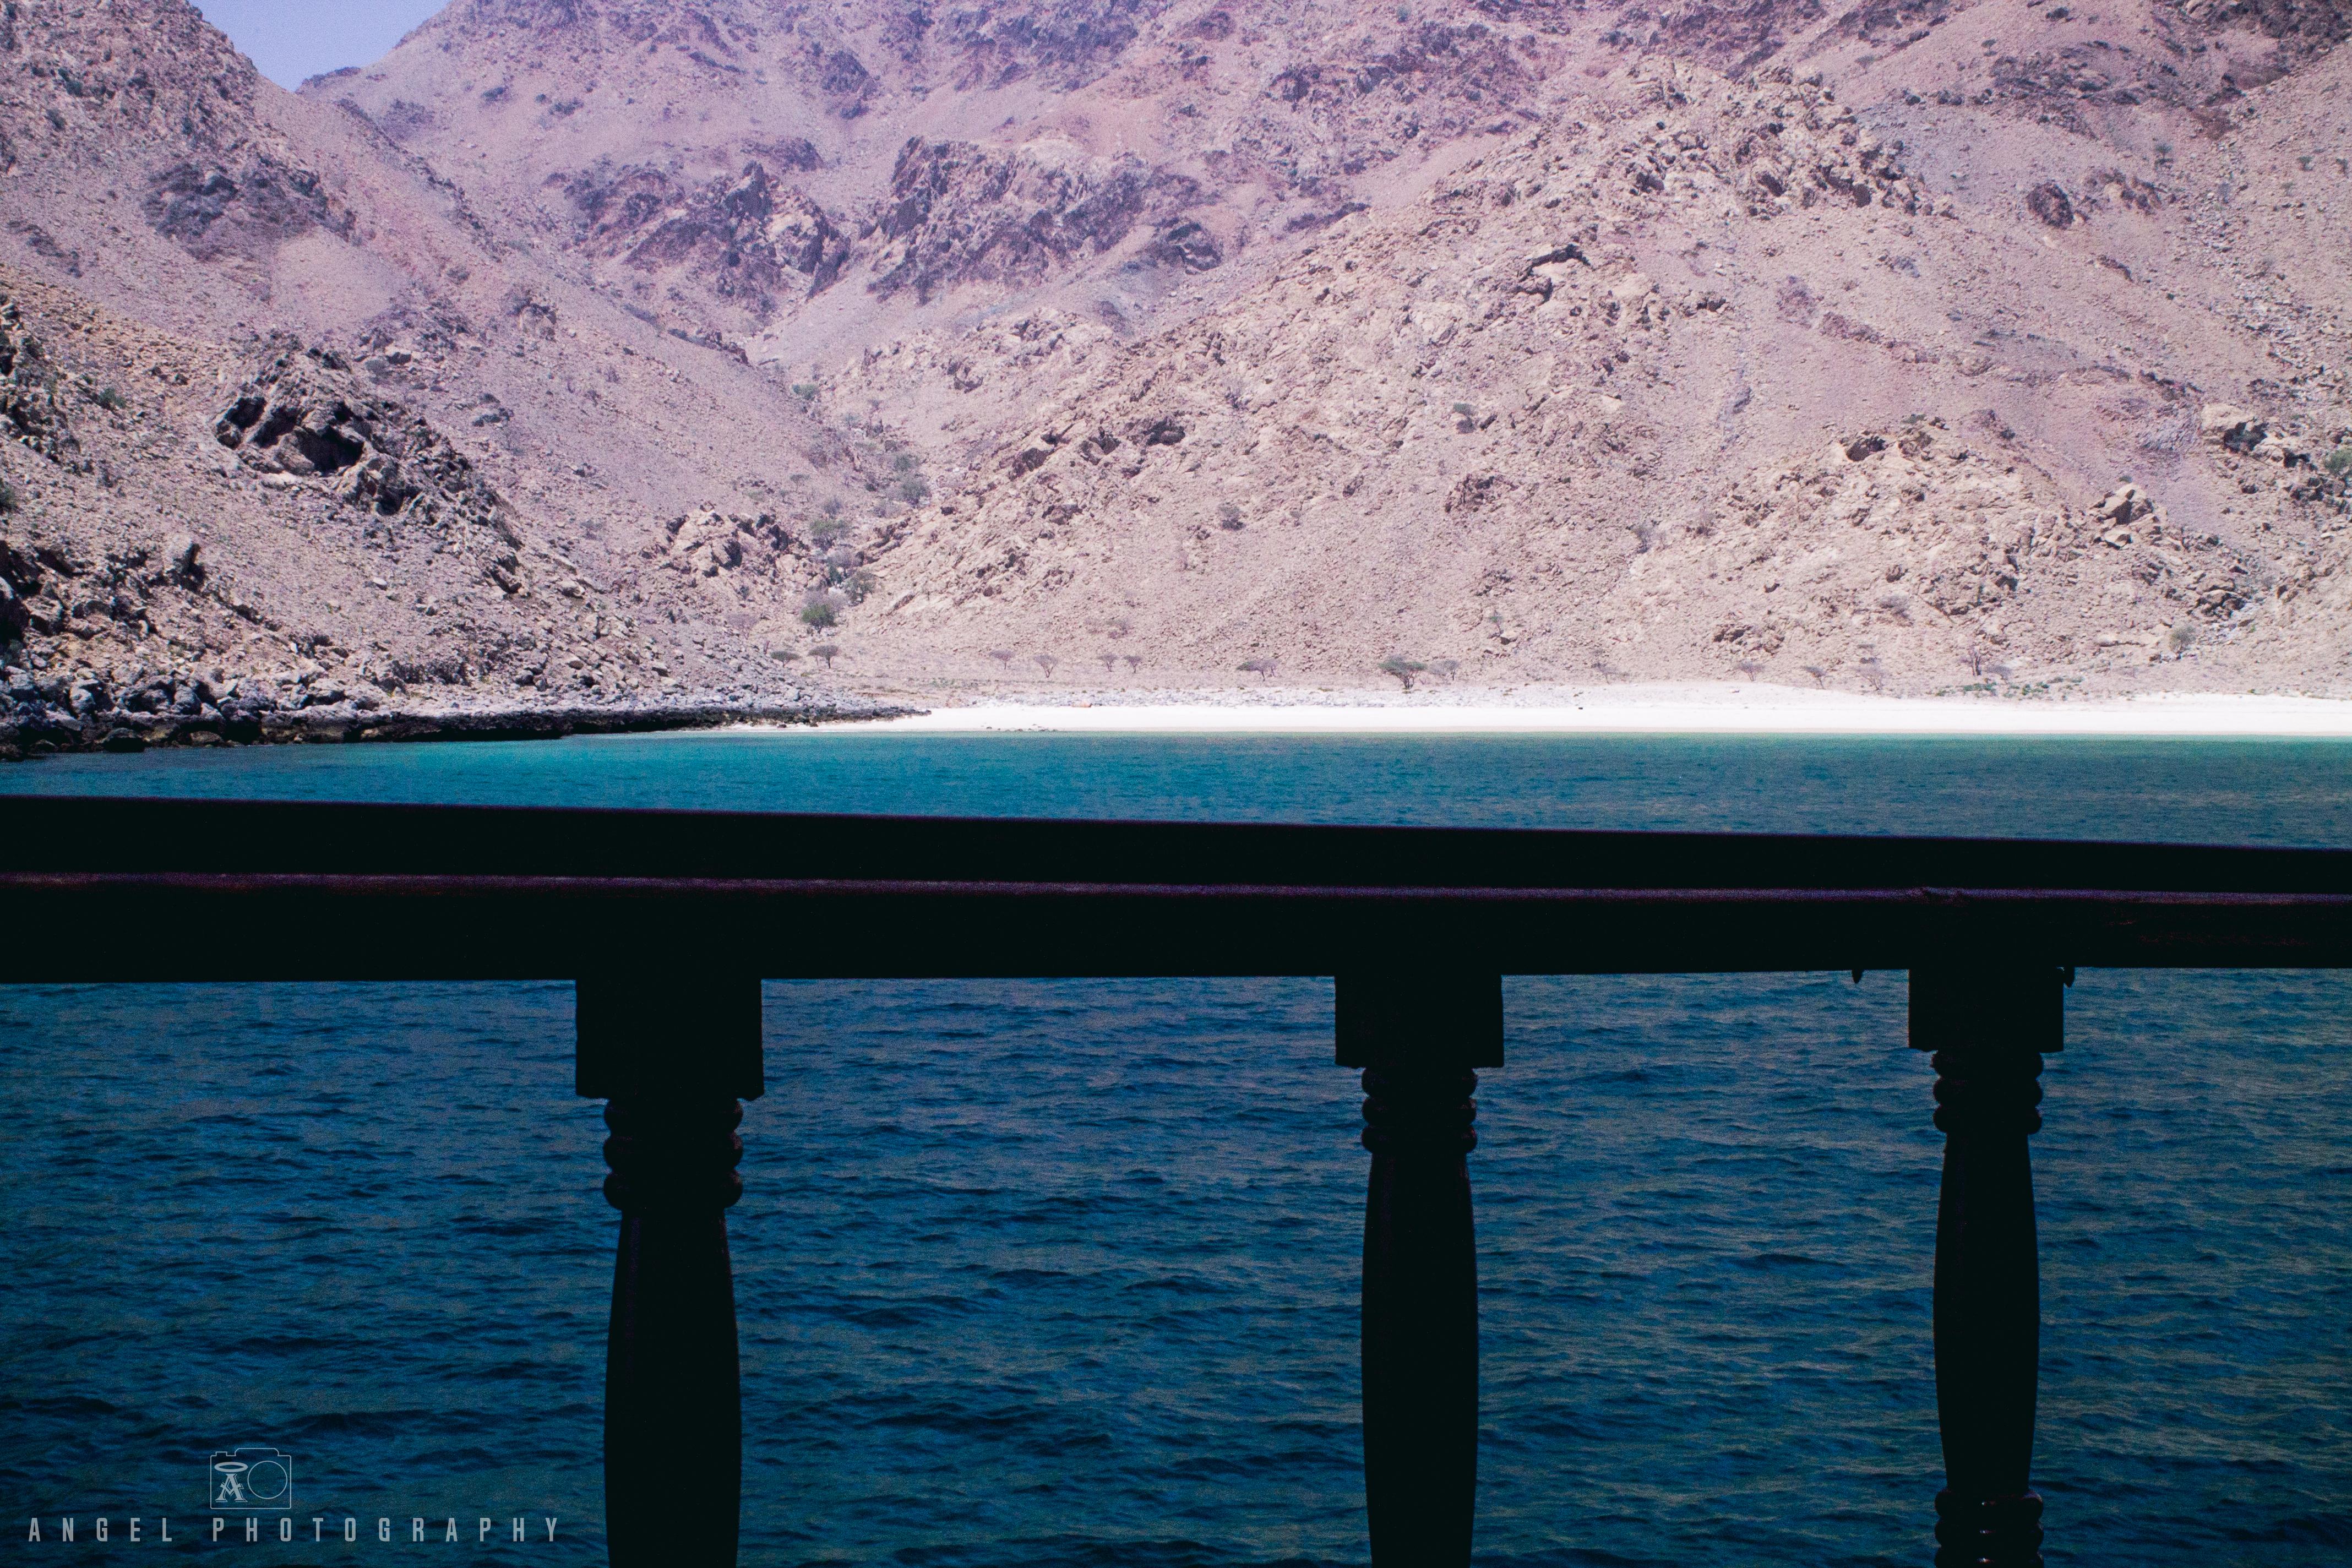 Dibba, Oman, Landscape, Dhow Cruise, Sailing, Beach, Rock Mountain